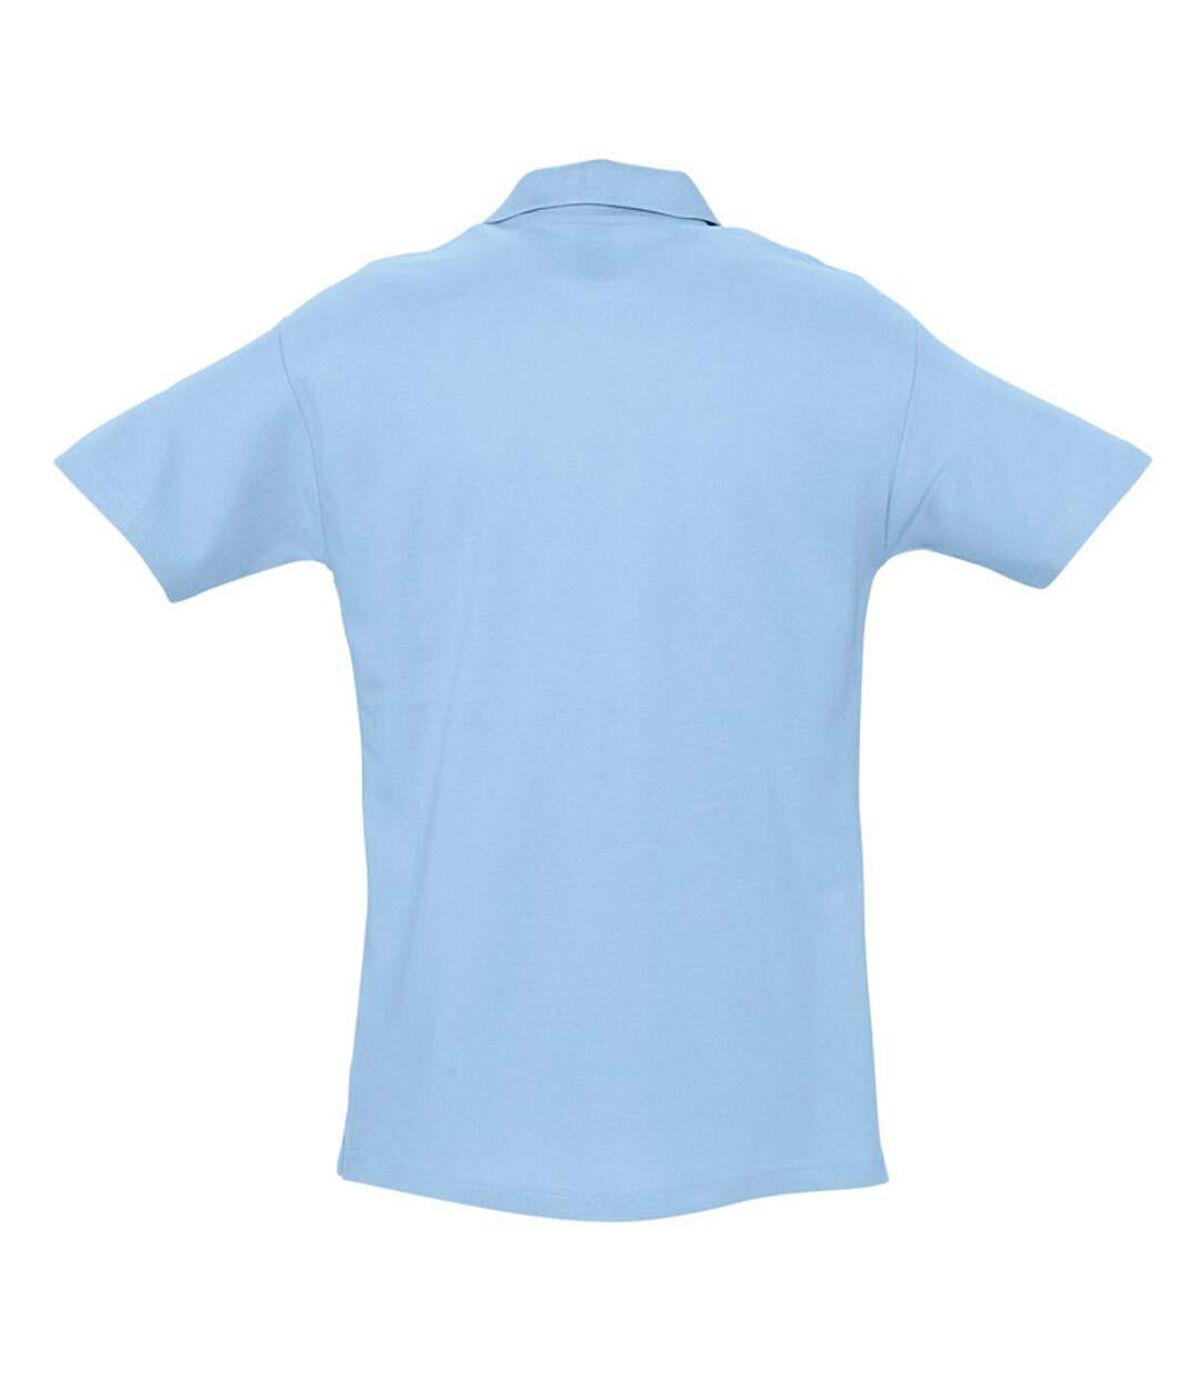 SOLS Mens Spring II Short Sleeve Heavyweight Polo Shirt (Sky Blue) - UTPC320